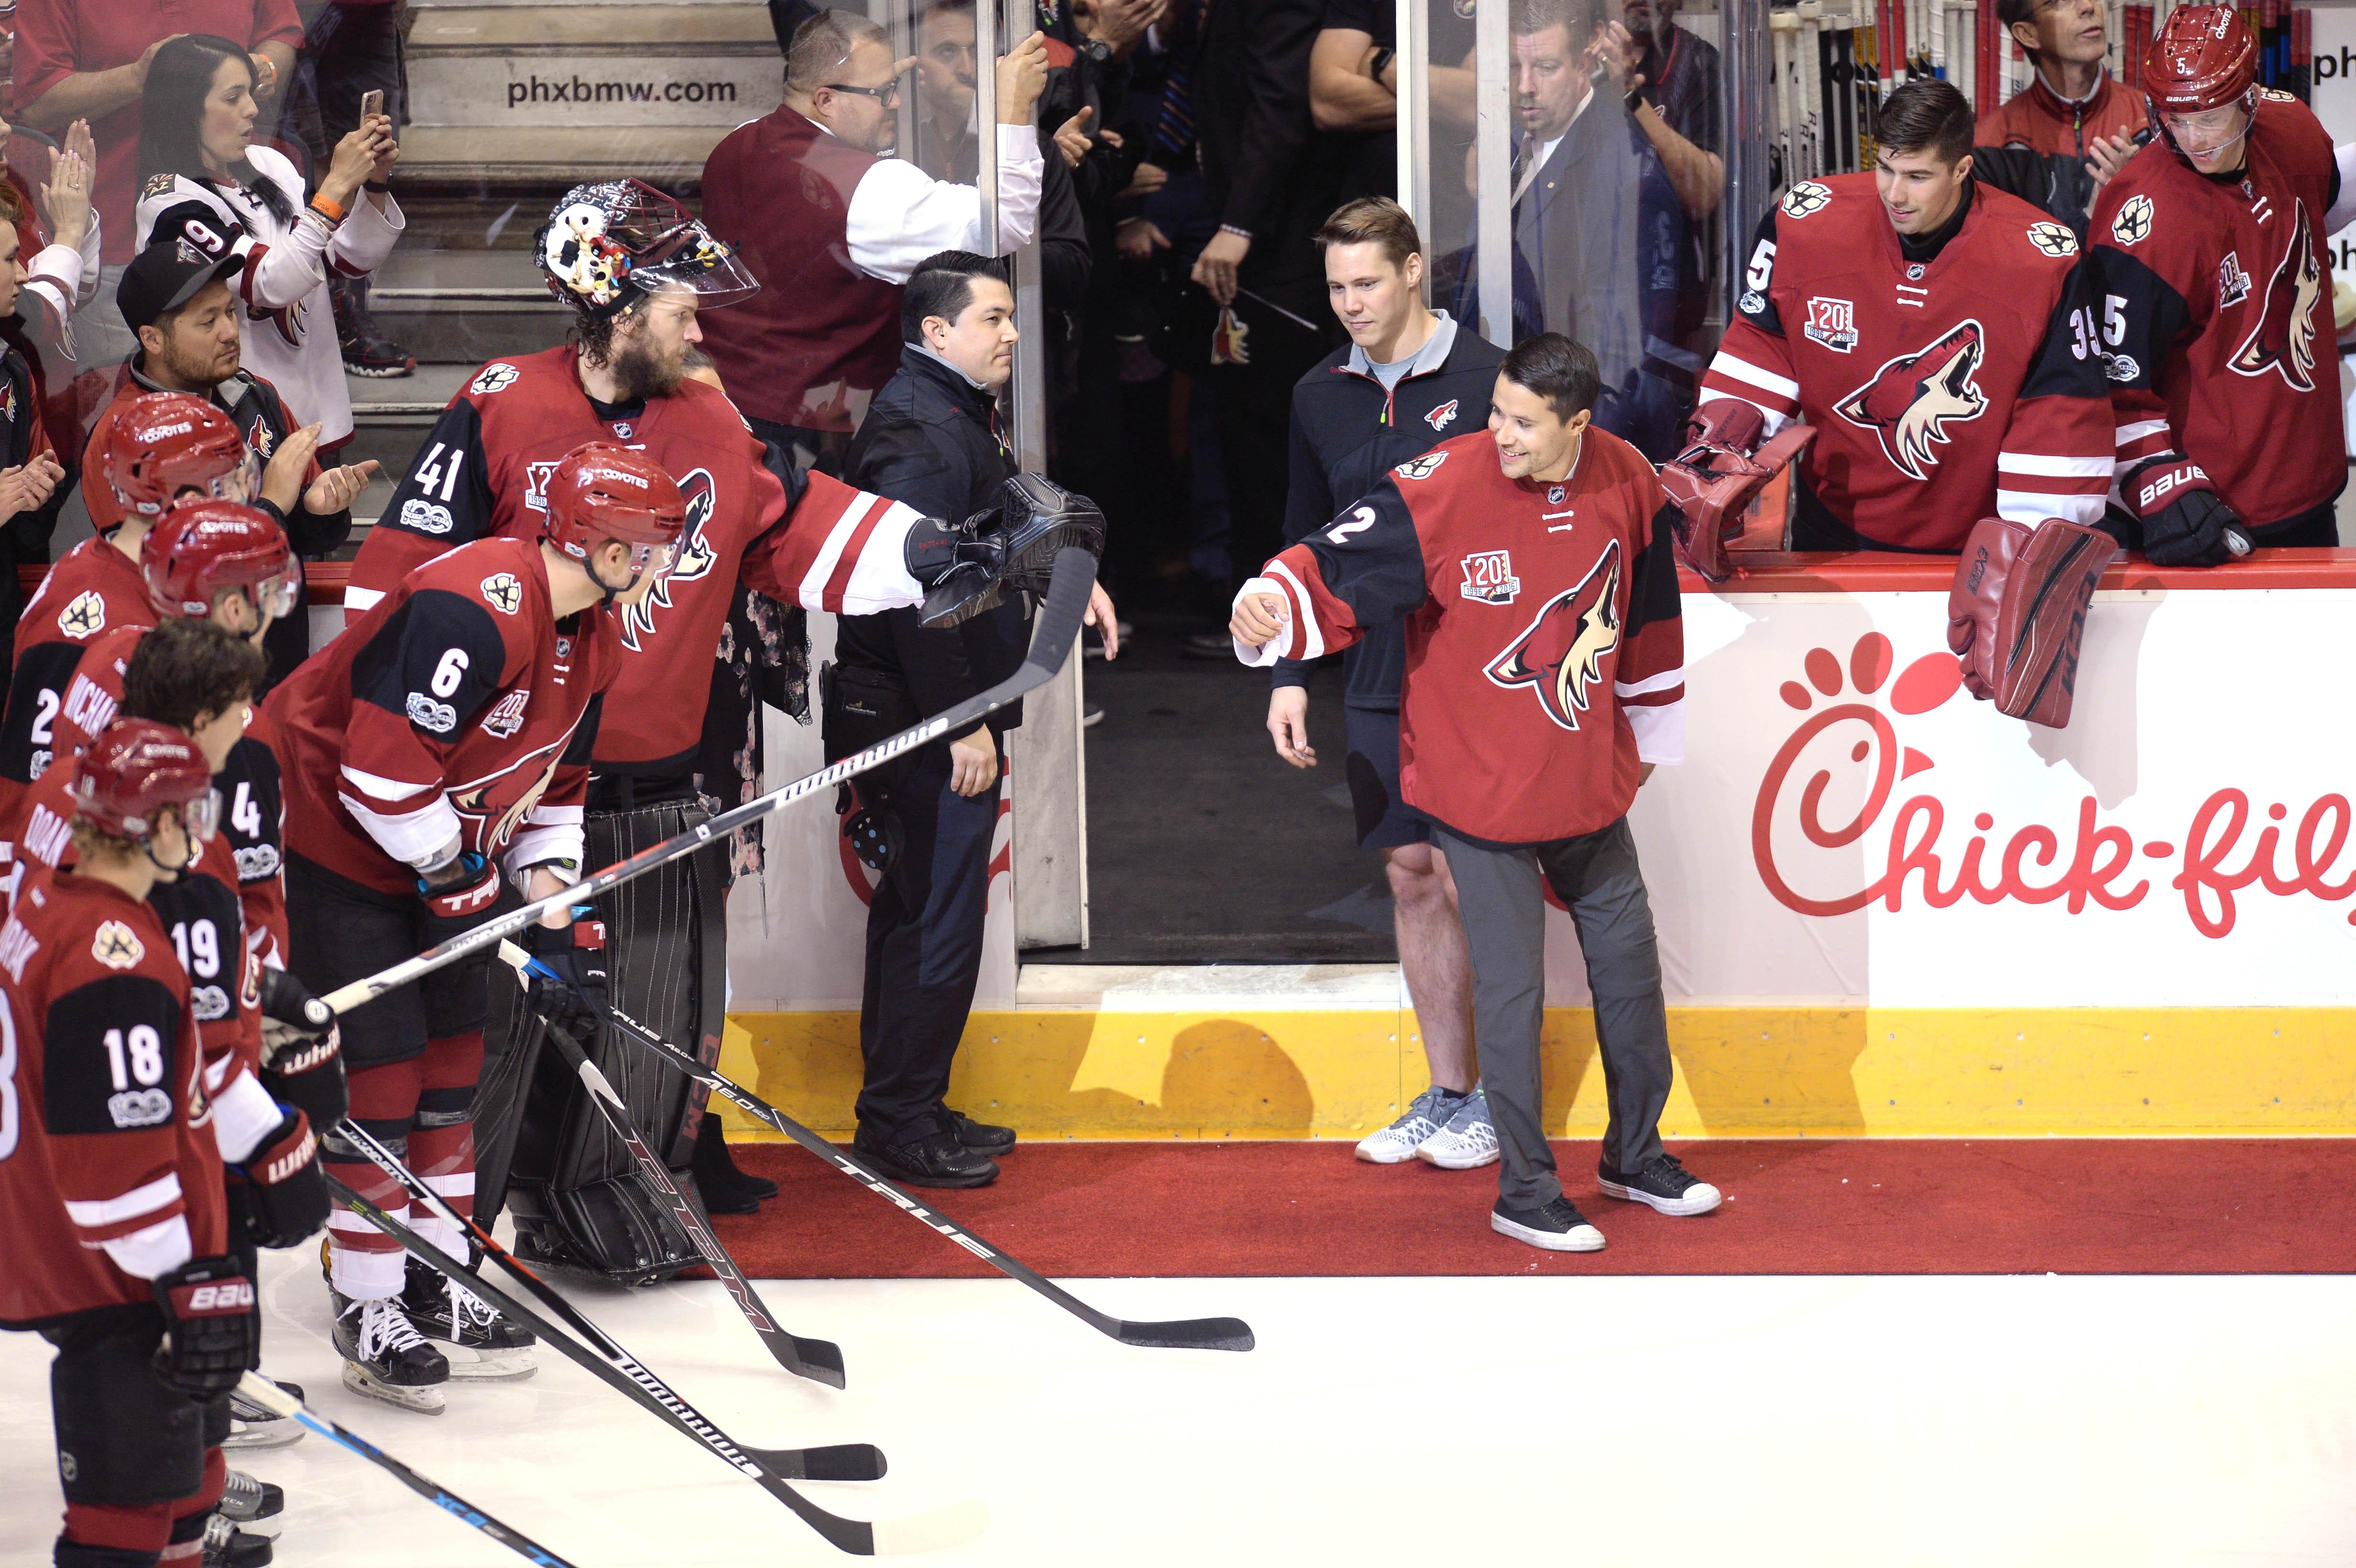 NHL: Minnesota Wild at Arizona Coyotes